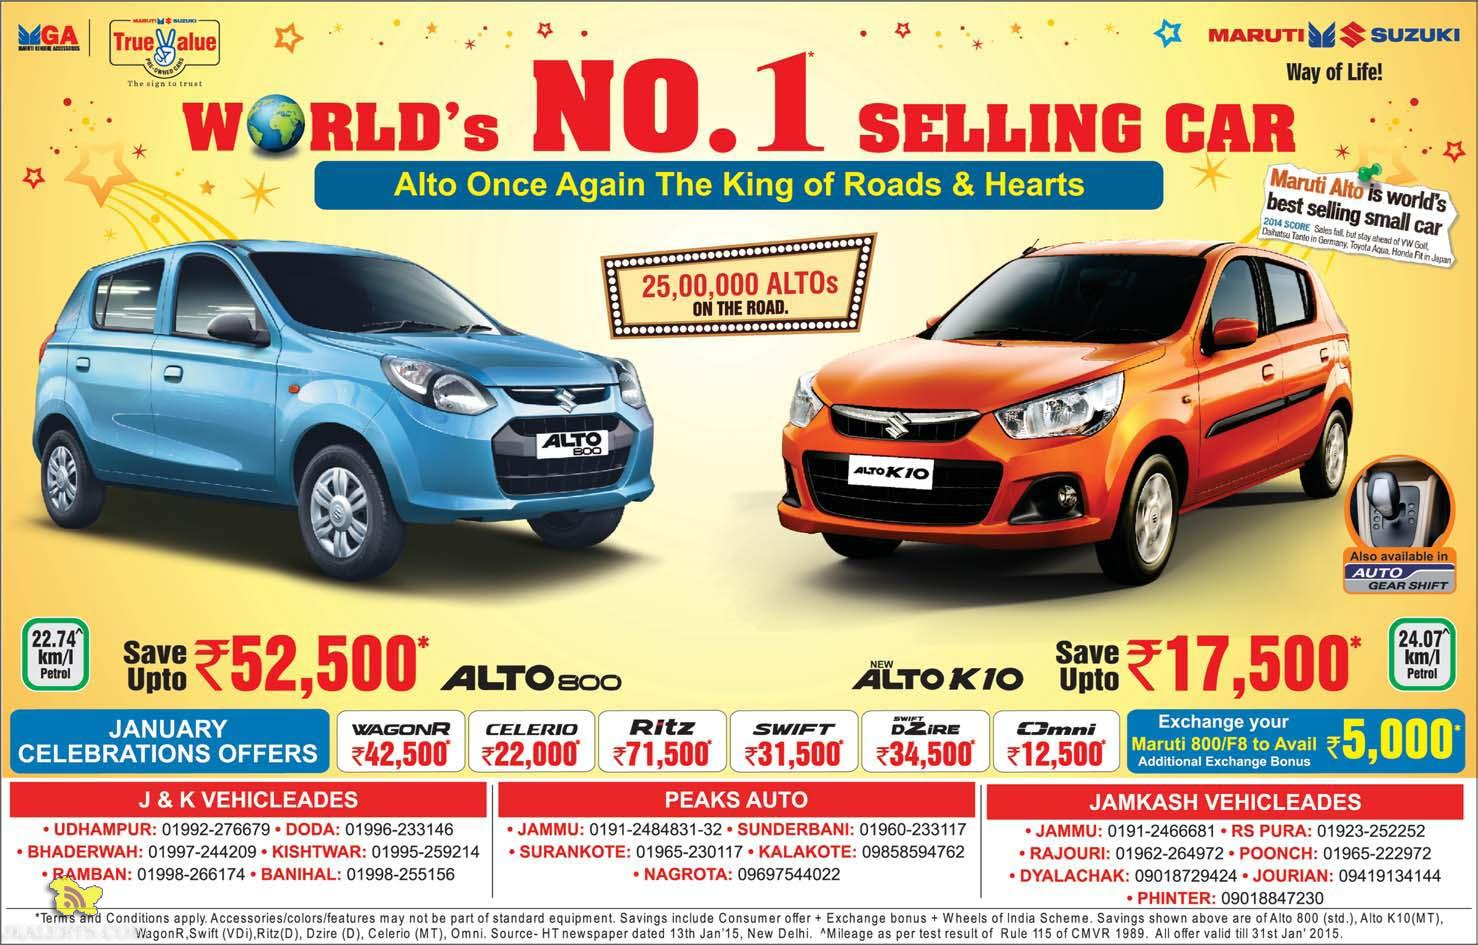 January Celebrations Offer In Maruti Suzuki Authorised Dealers